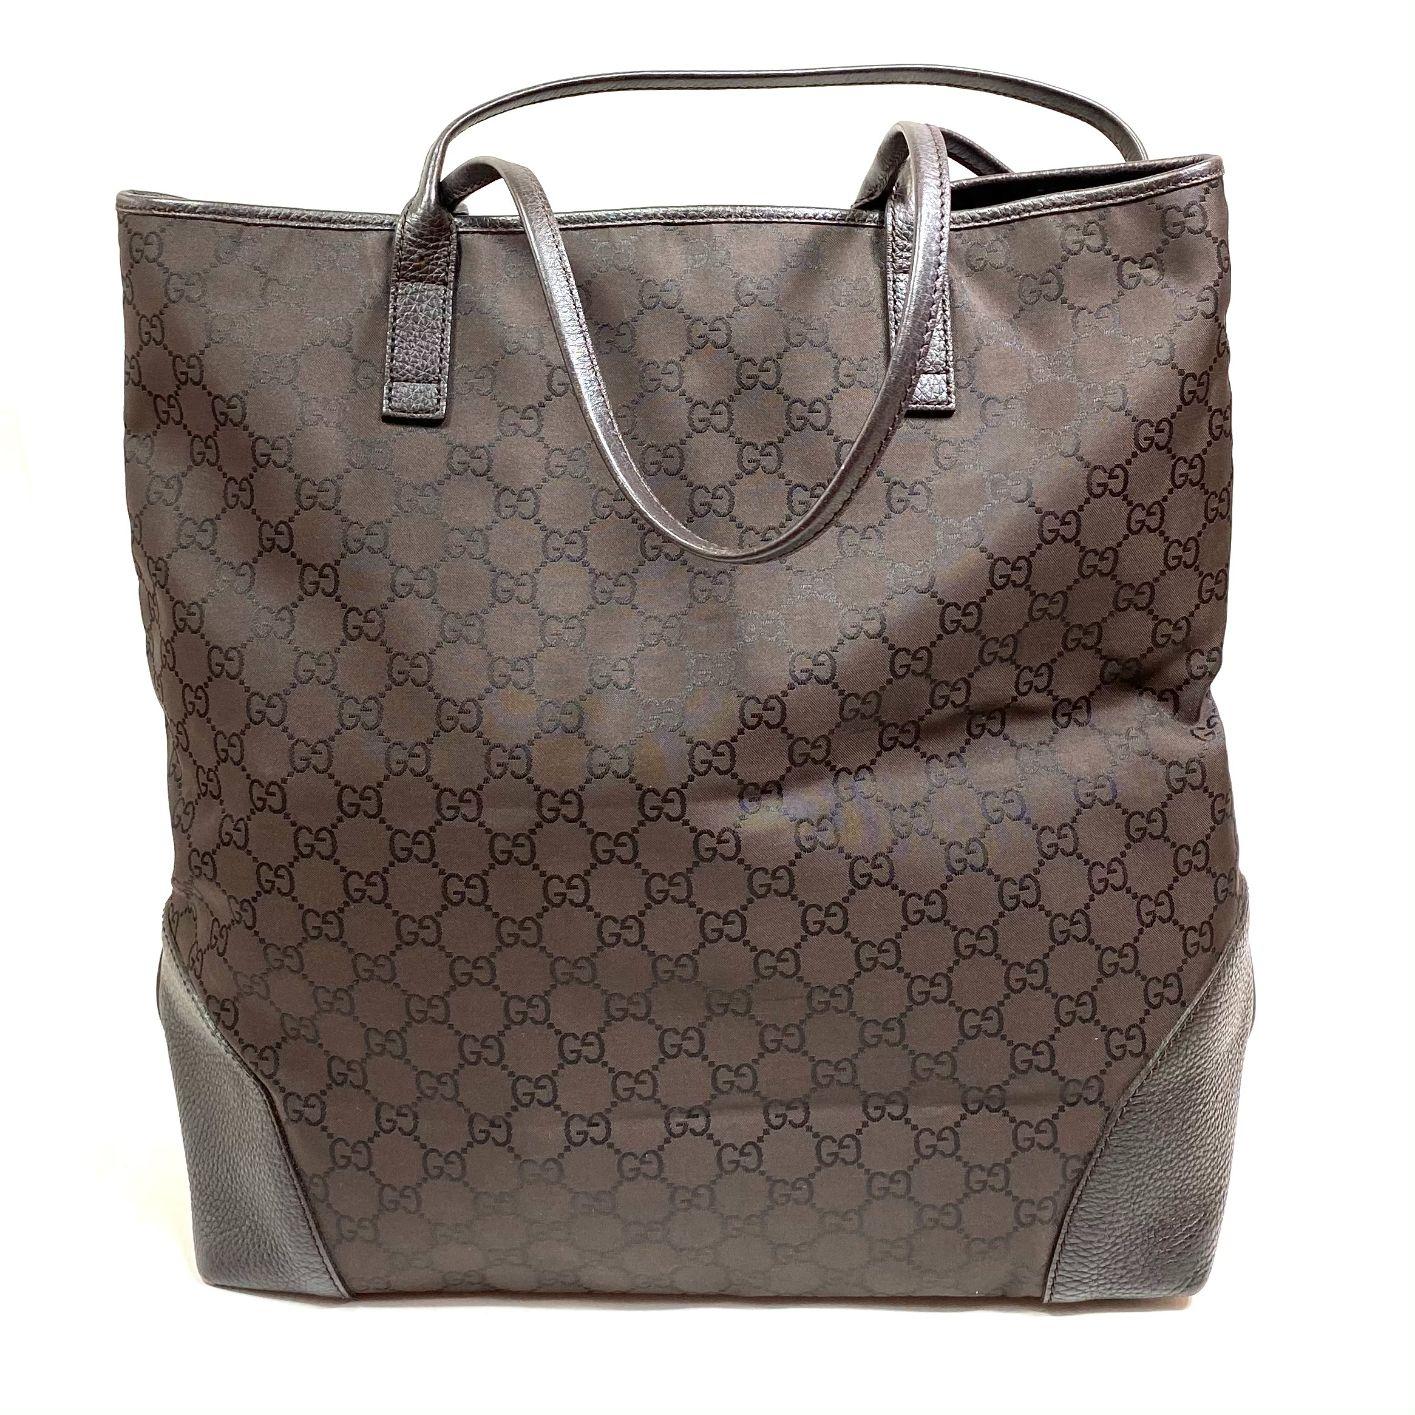 Bolsa Gucci Shopping GG Monograma